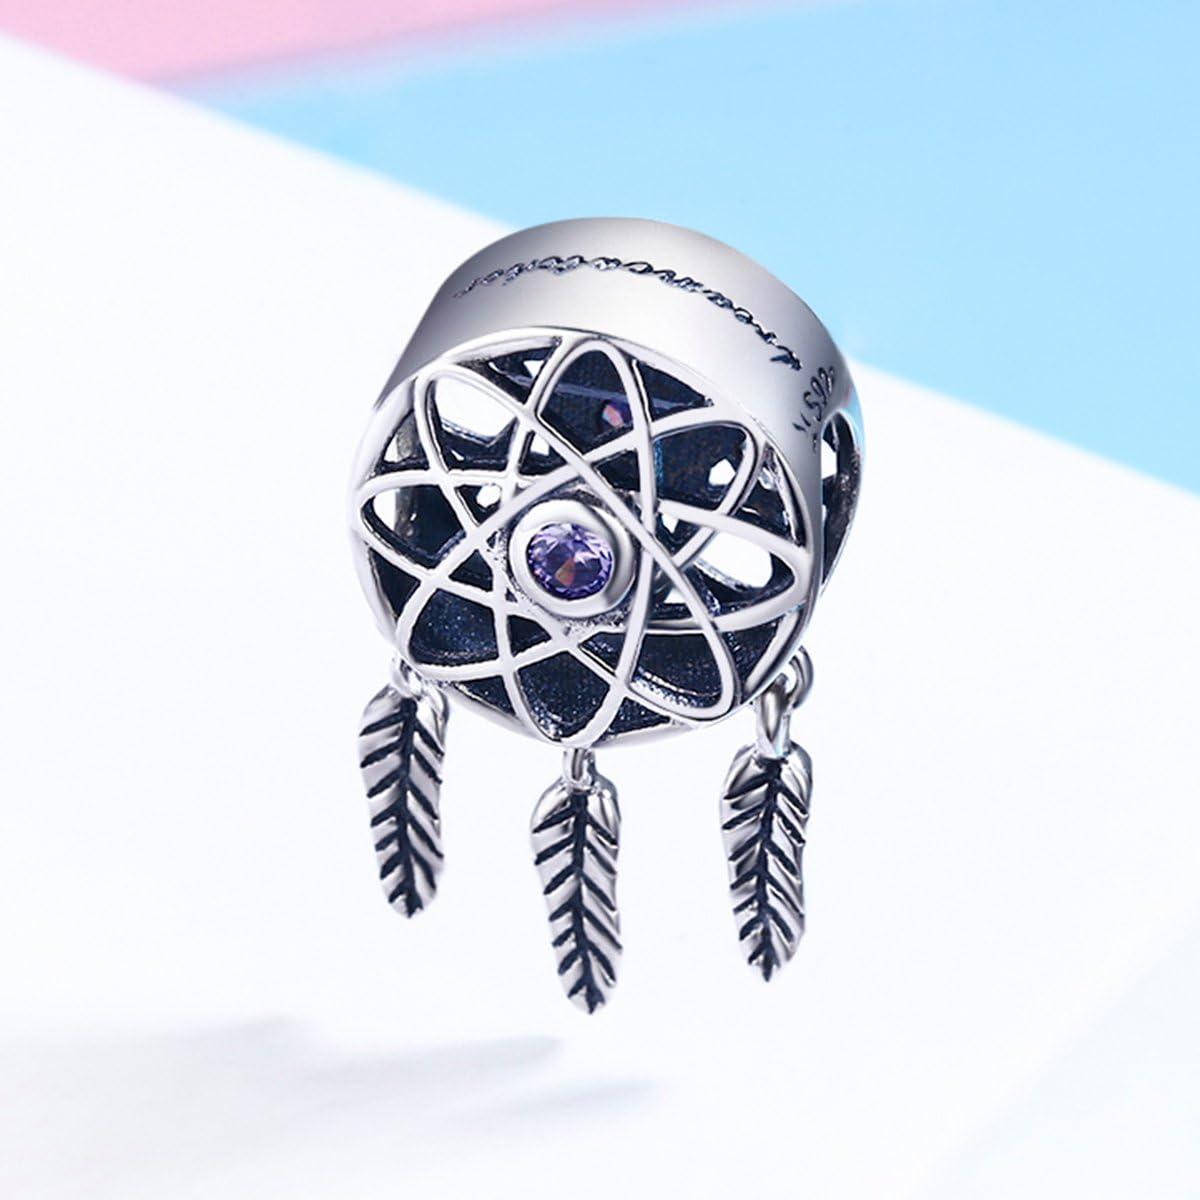 BAMOER 925 Sterling Silver Retro Openwork Flourishing Flower Charm Beads fit Women Charm Bracelet